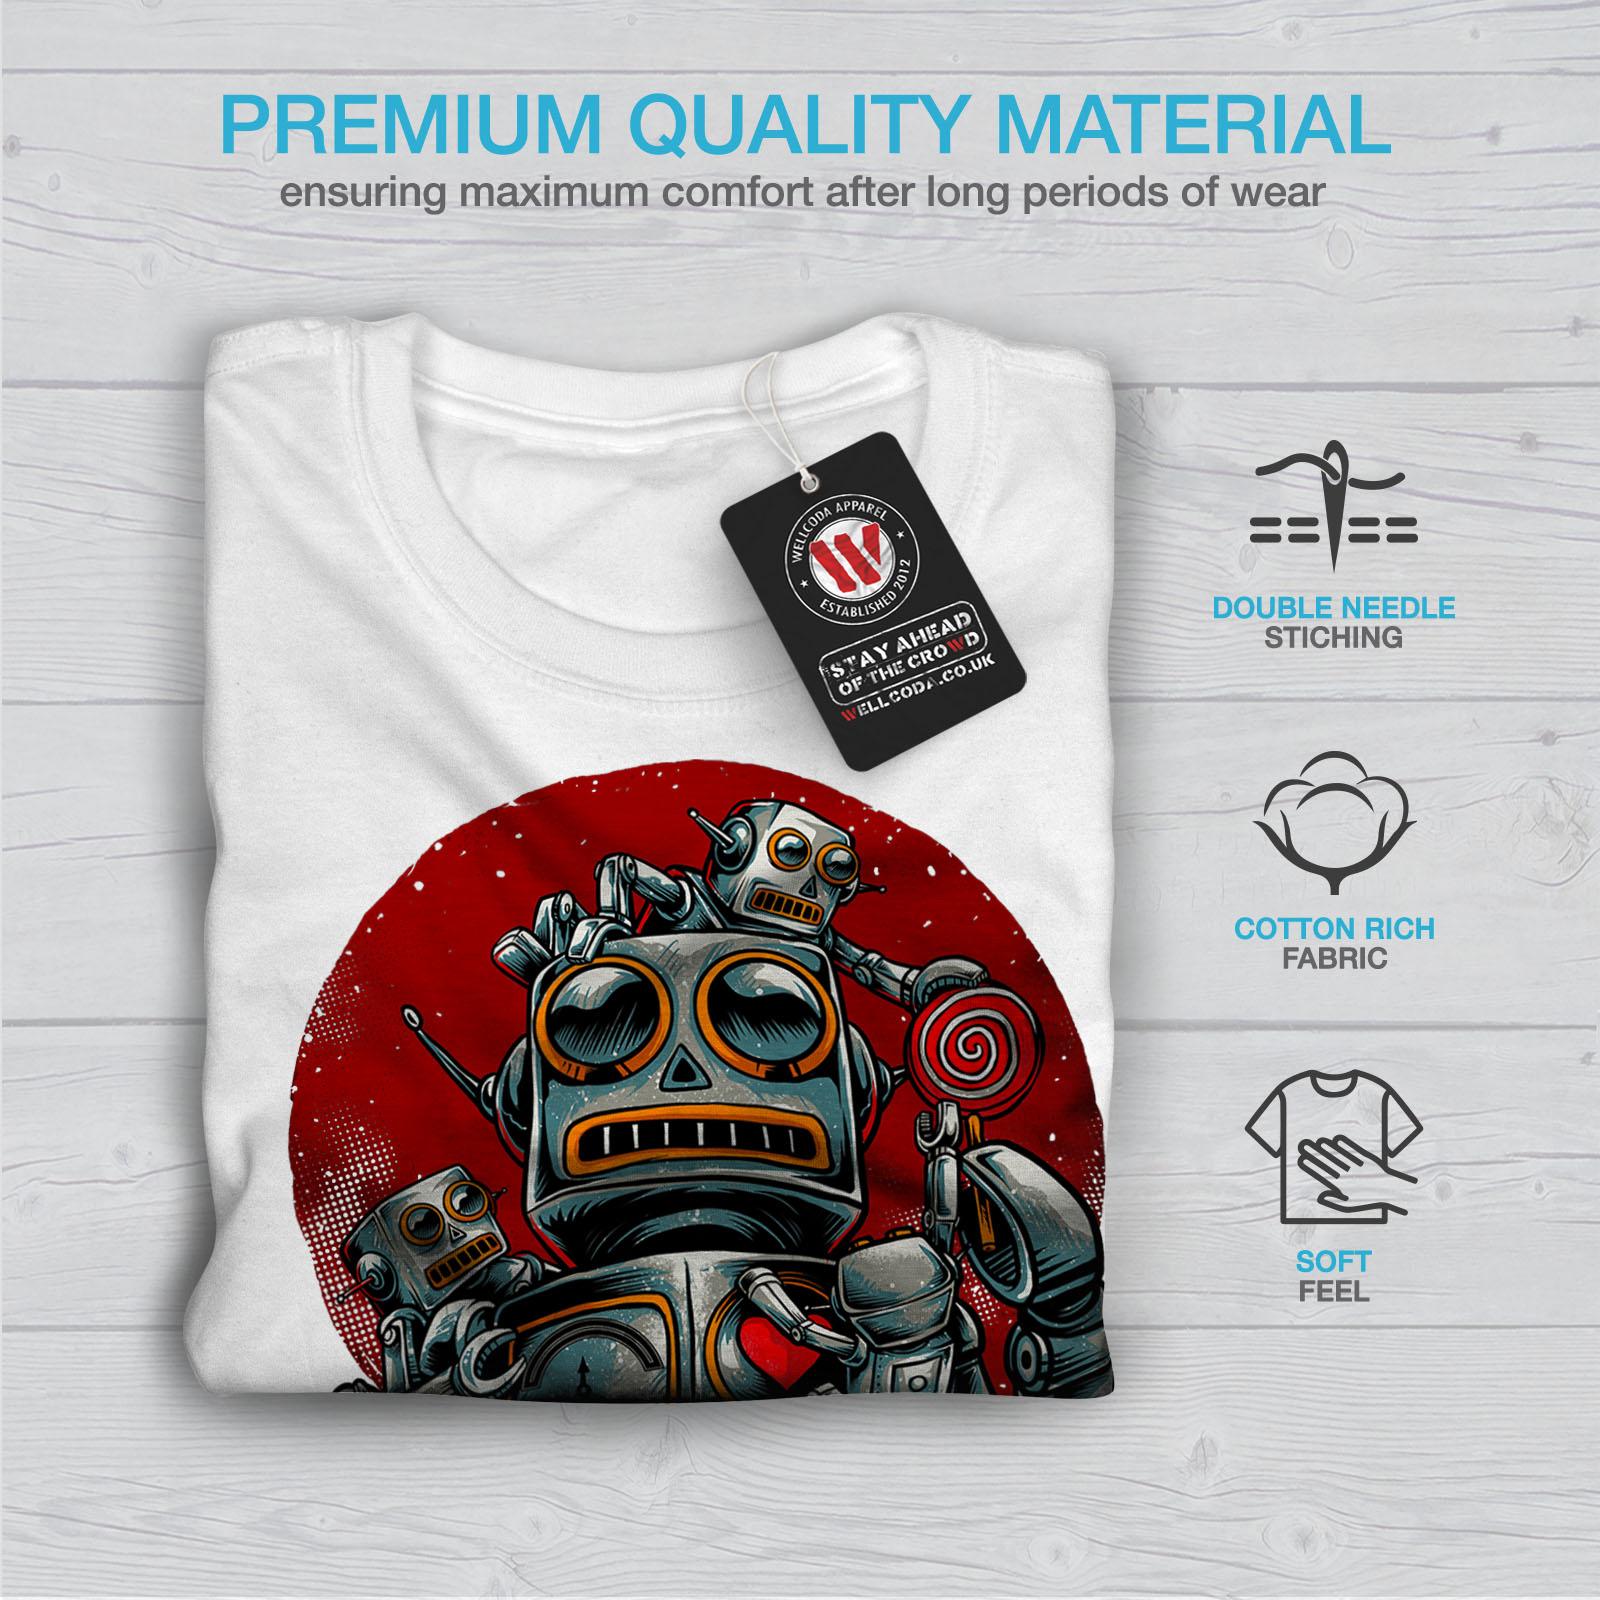 miniature 13 - Wellcoda Crazy Robot Mens T-shirt, Mechanical Graphic Design Printed Tee